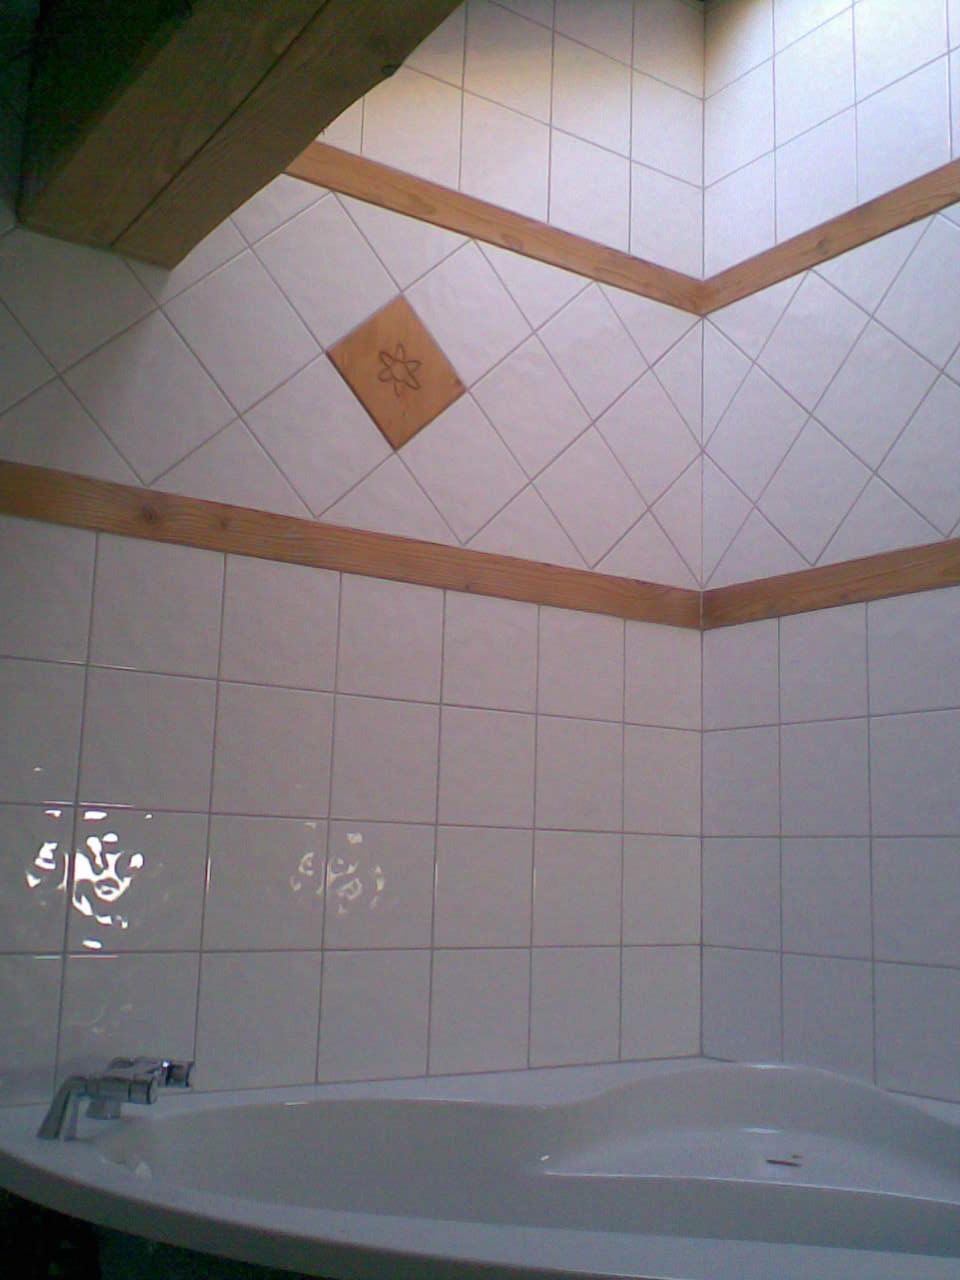 Faience bleue salle de bain - Model de faience pour salle de bain ...